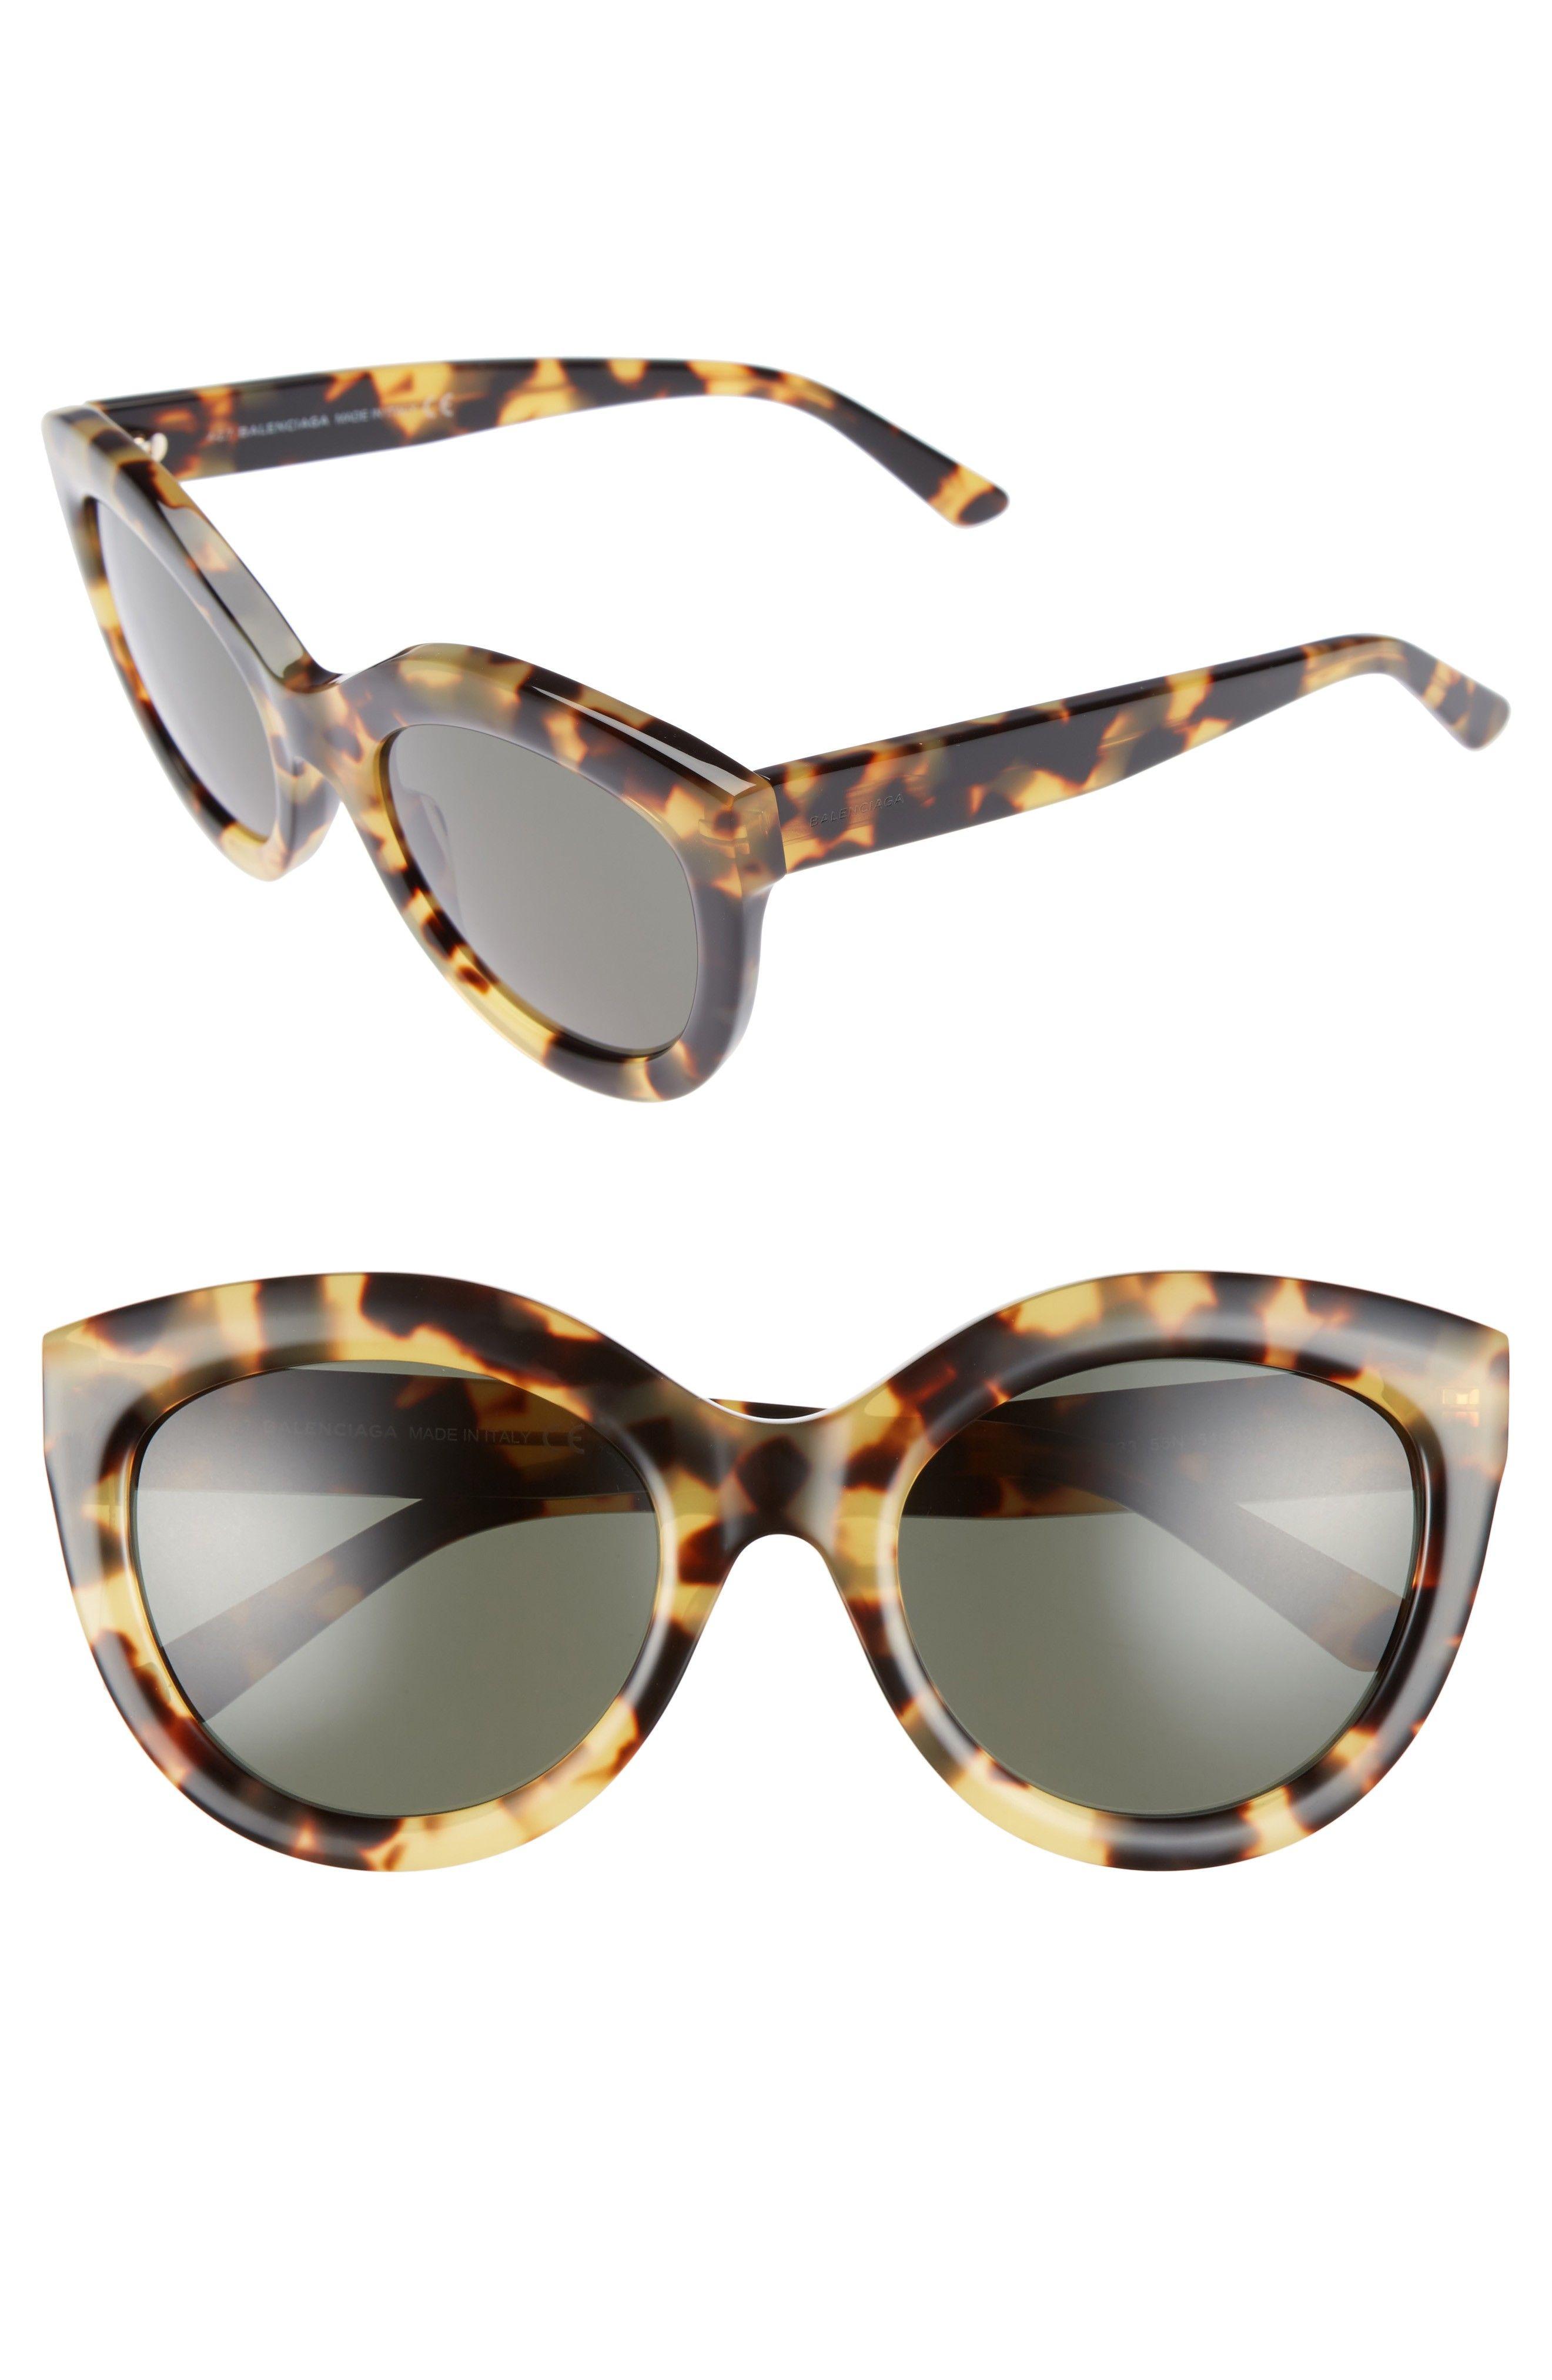 29bd12fc41 balenciaga tortoiseshell cat eye sunglasses